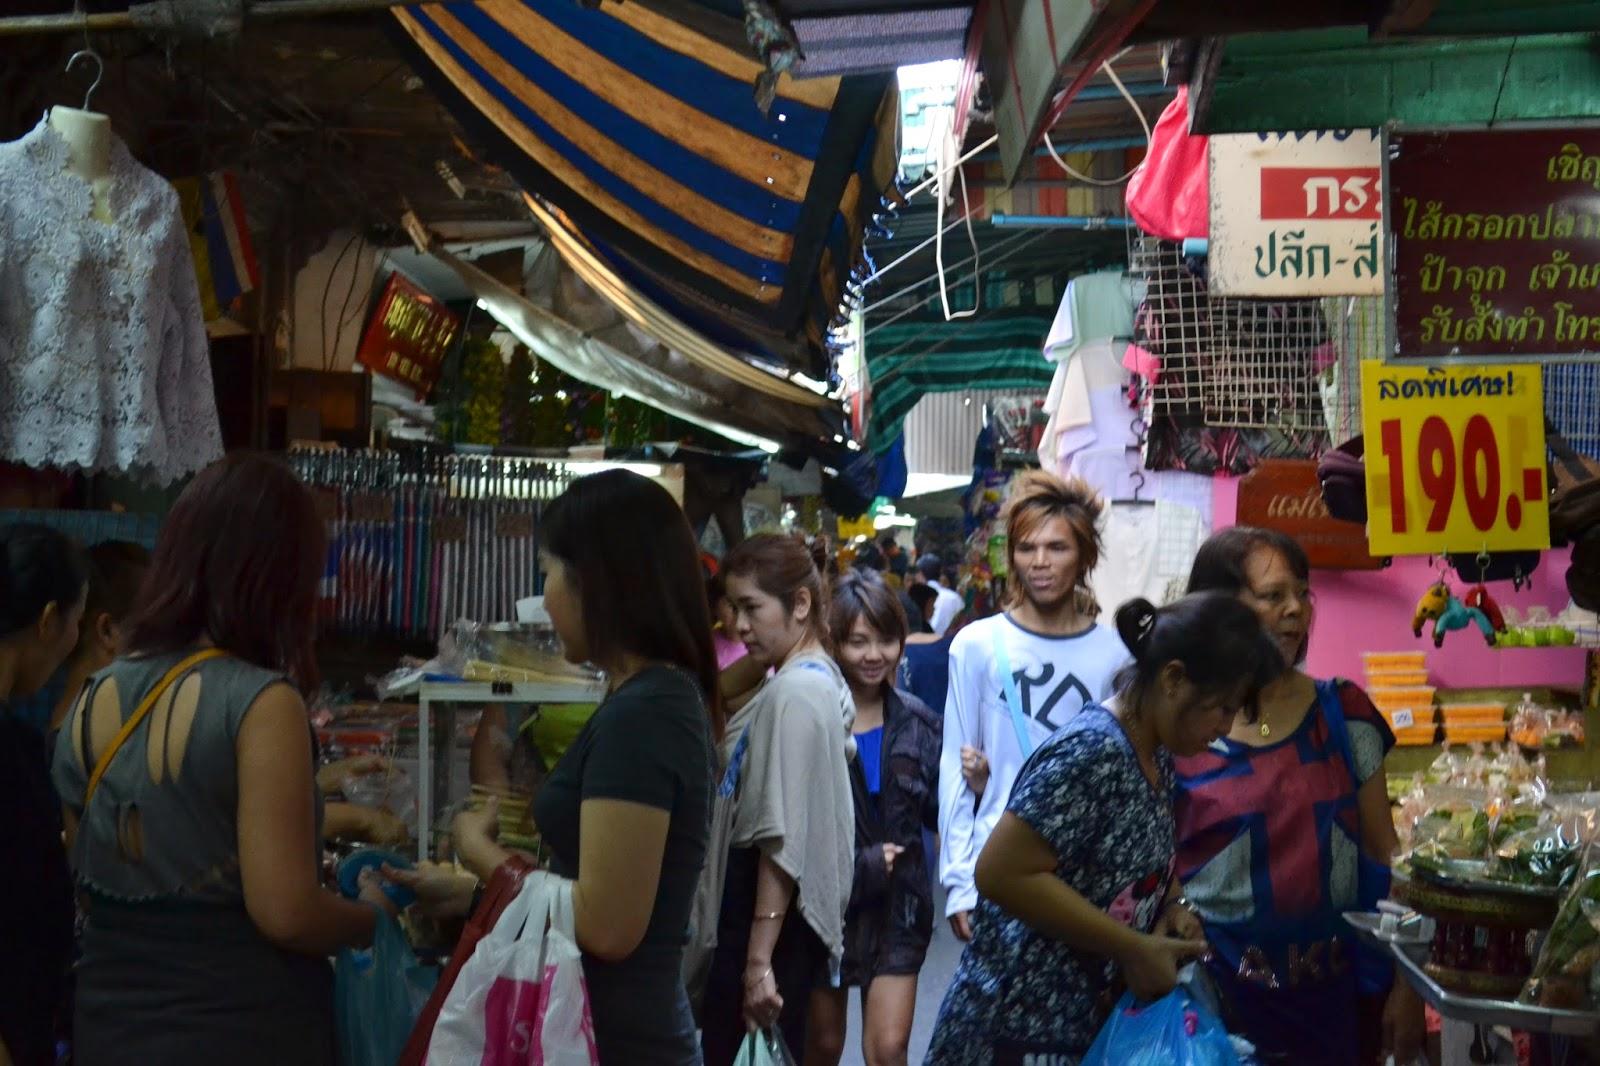 bangkok, voyage, quartier indien